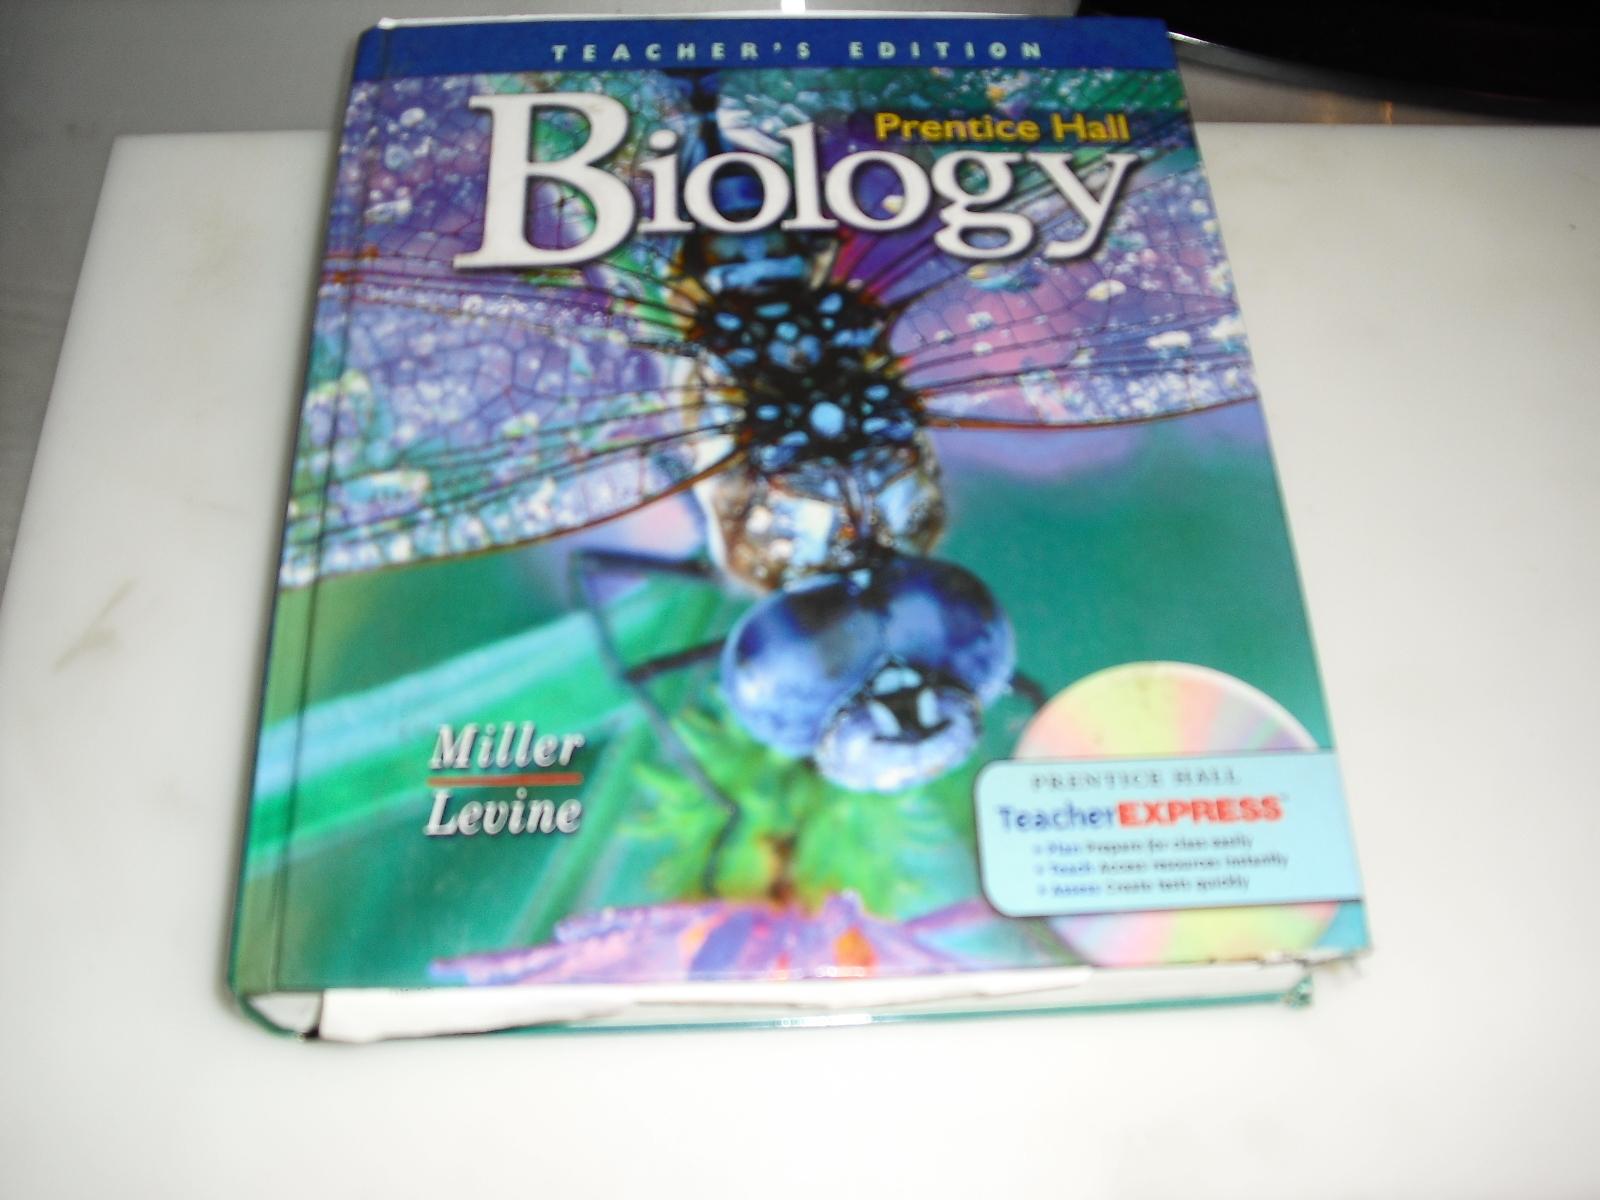 teachers  edition  biology   prentice  hall